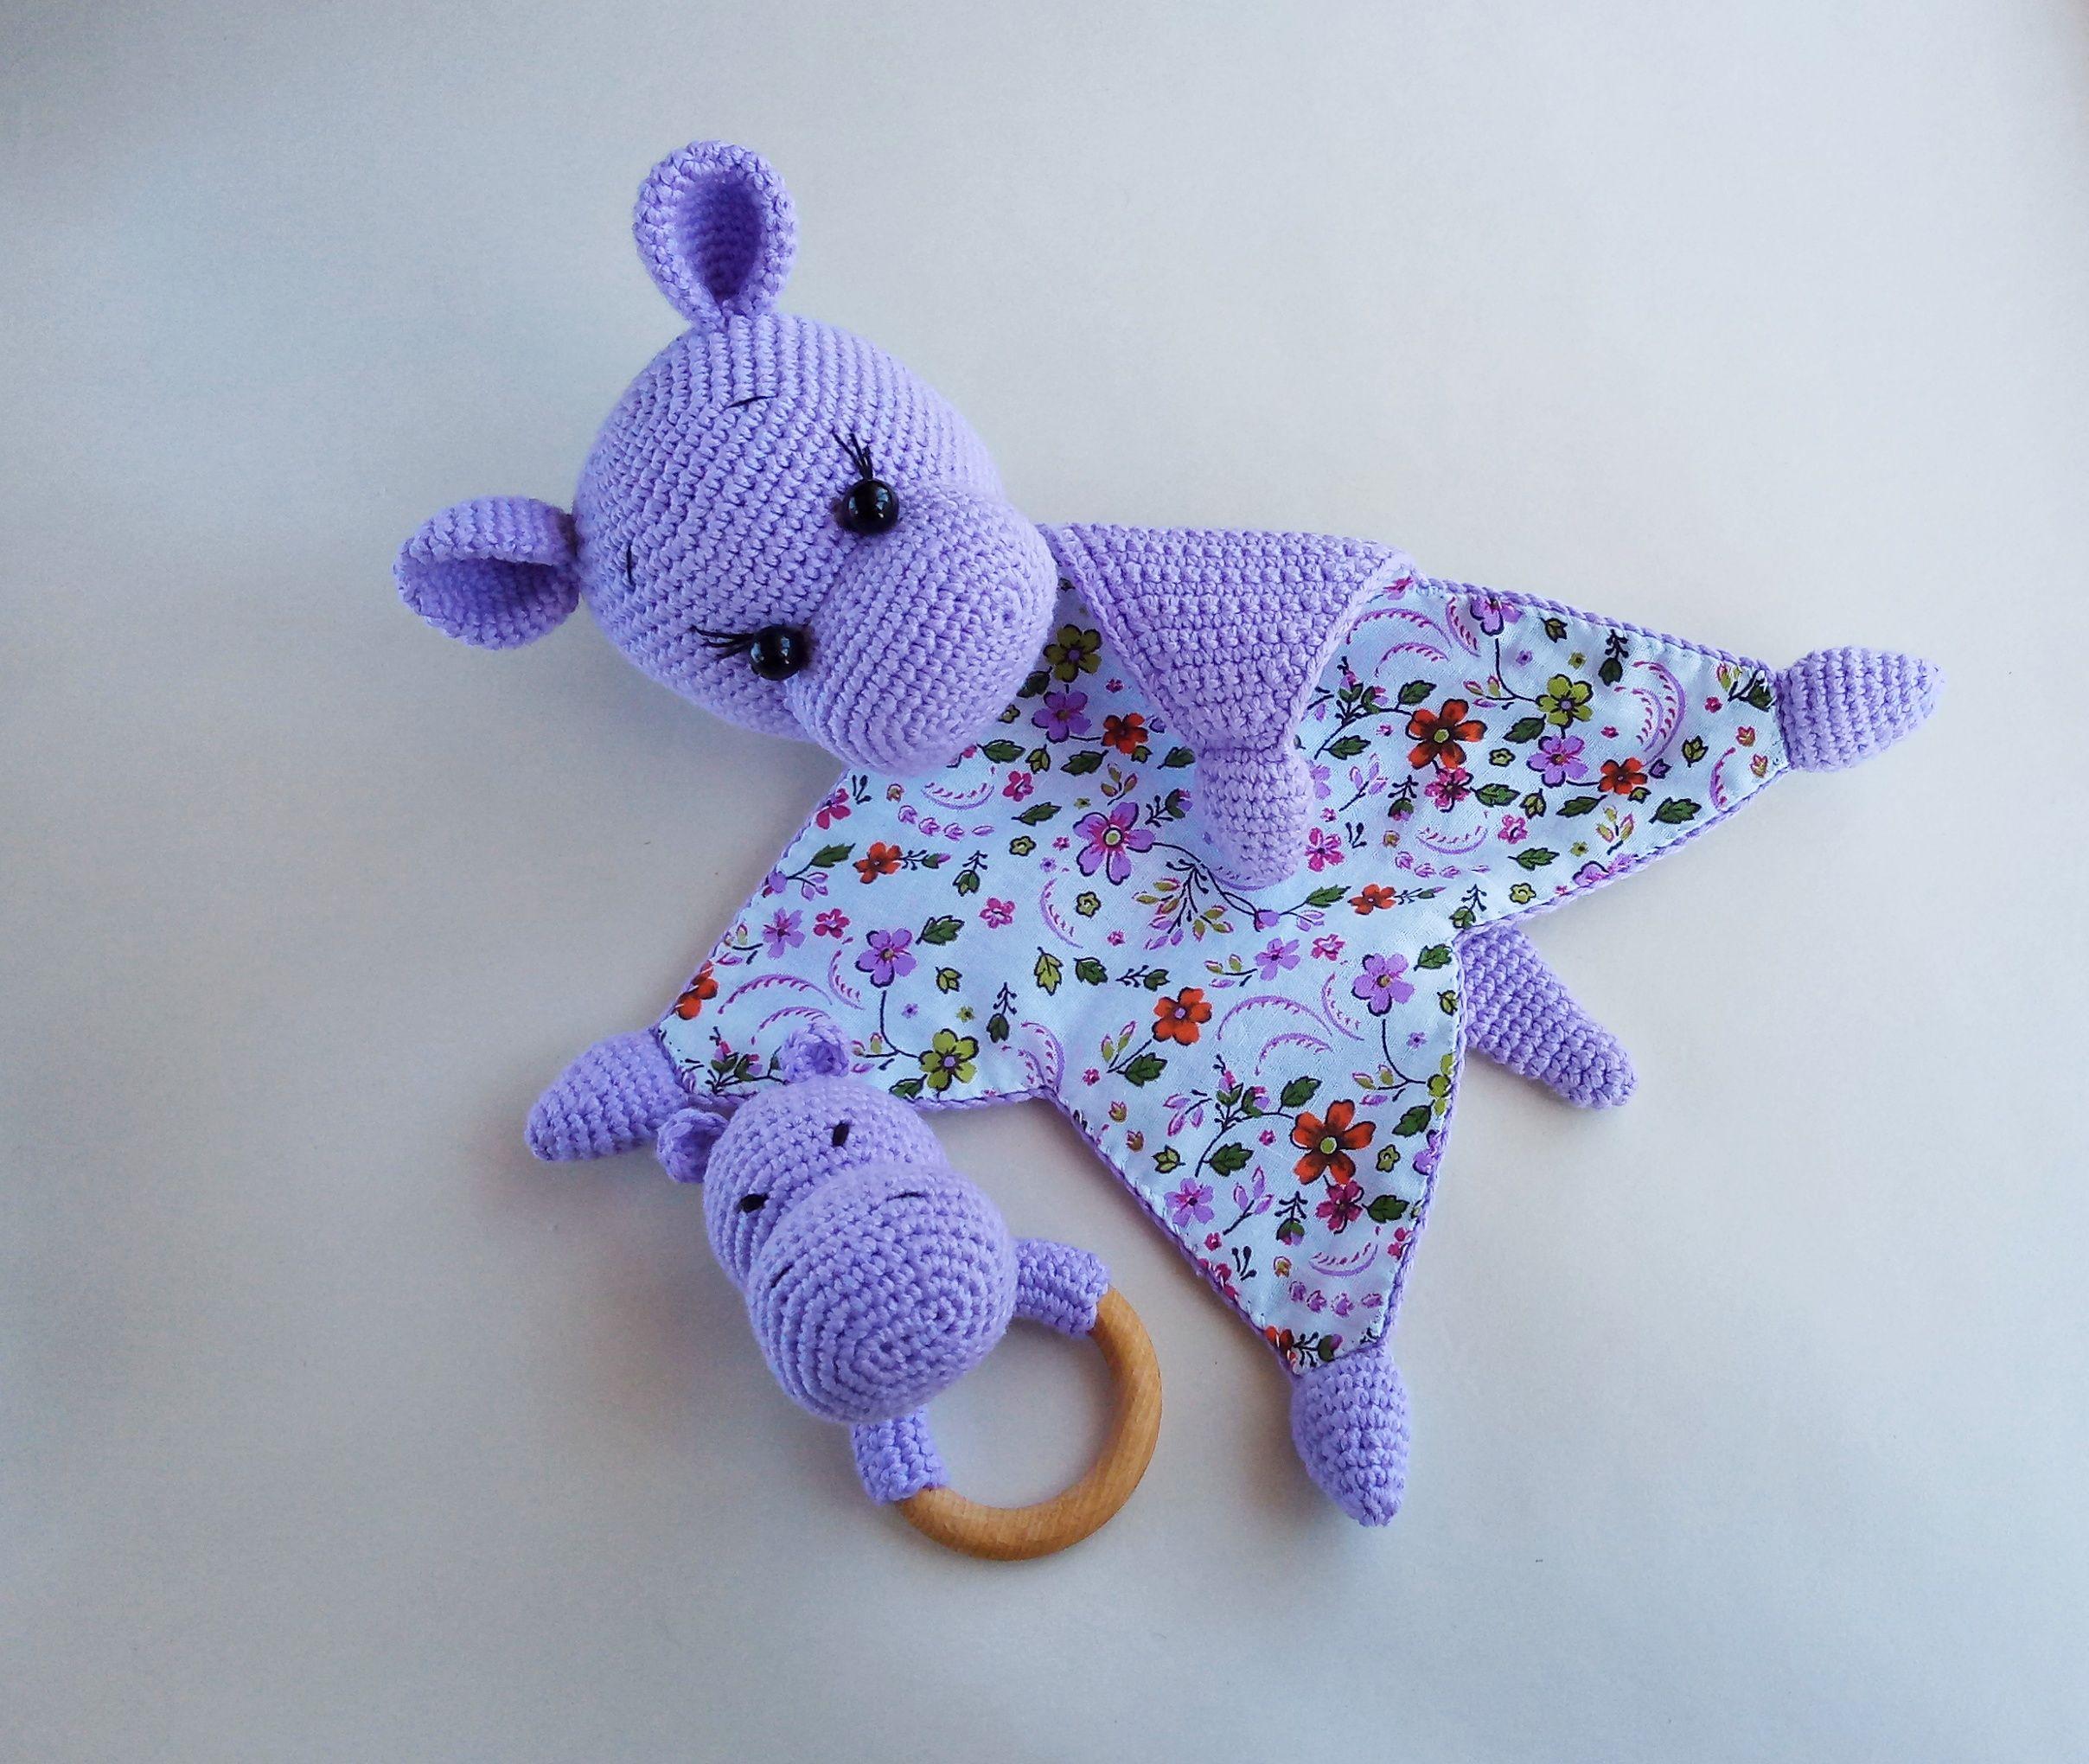 baby comforter natural toy for sleeping #crochetsecurityblanket